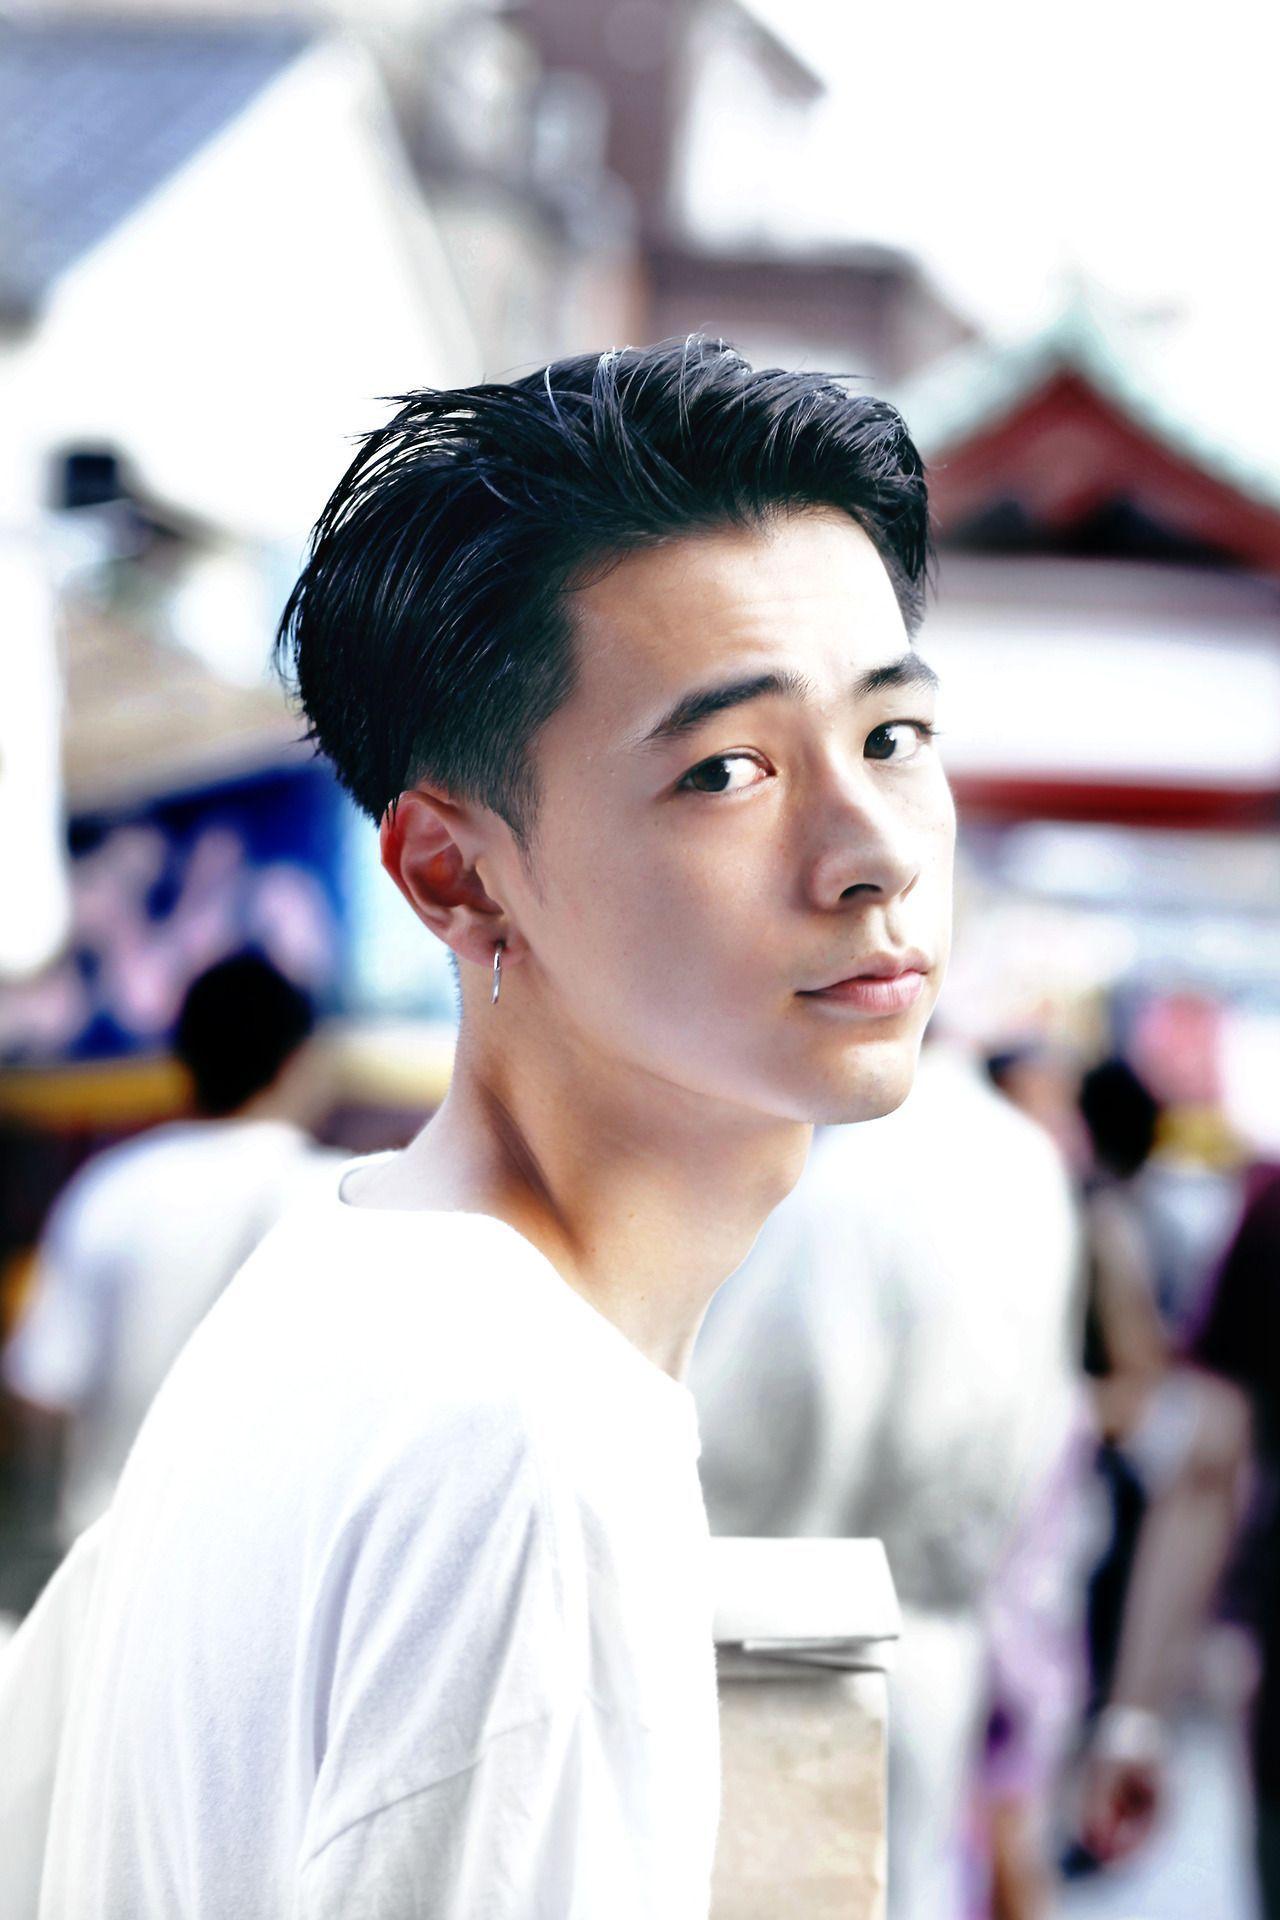 二十三 夏 成田凌 二十才 asiatische frisuren herren manner